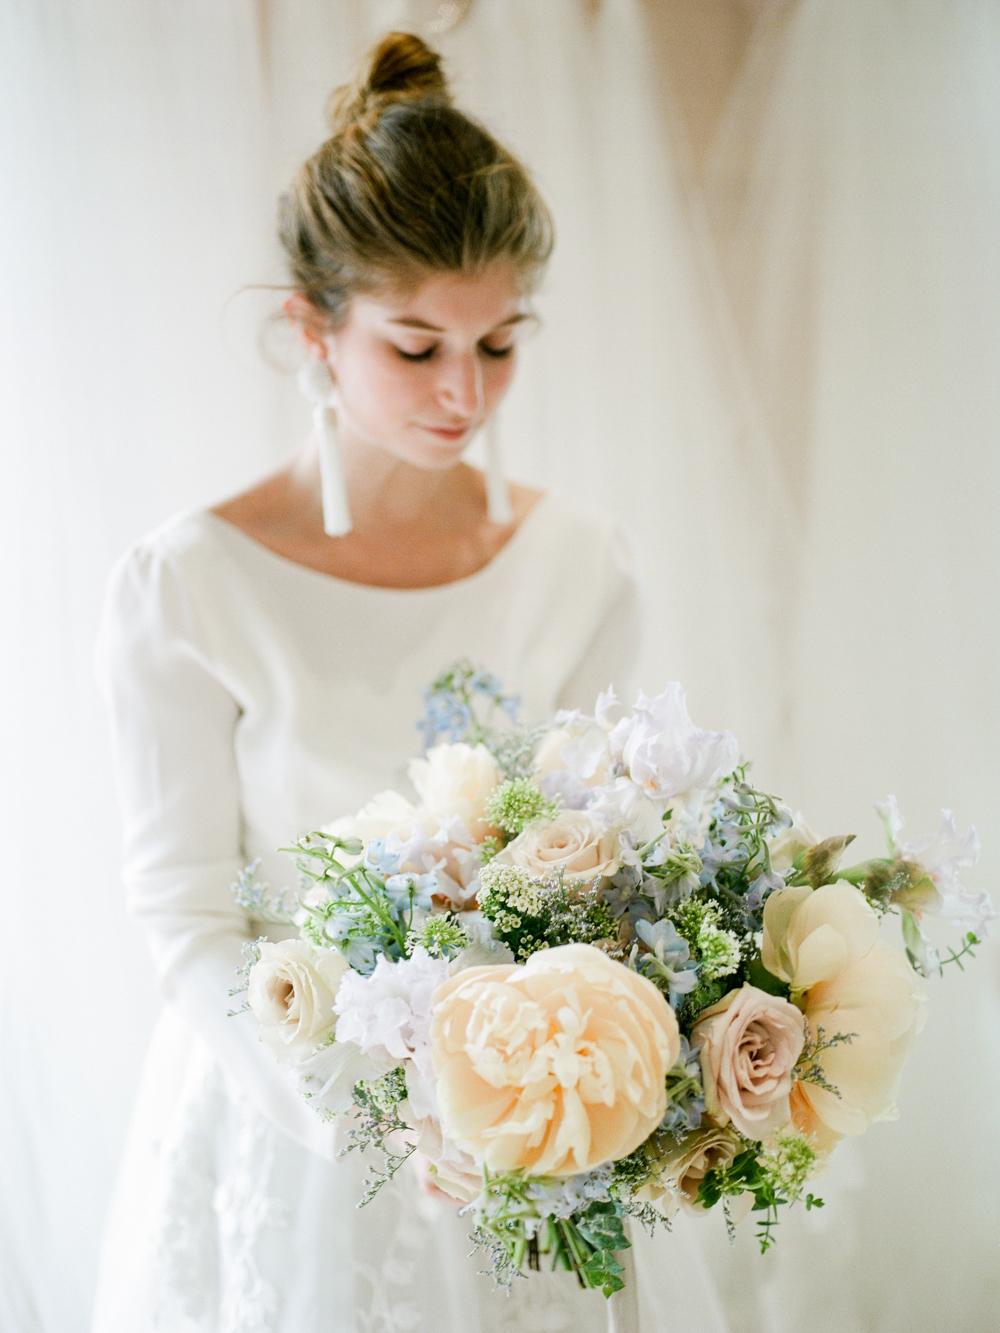 Christine Gosch_Houston wedding photographer_wedding dress styles_Houston wedding boutique_Marchesa wedding dress_ Tara Lauren bridal wedding dress_Alexandra Grecco-10.jpg